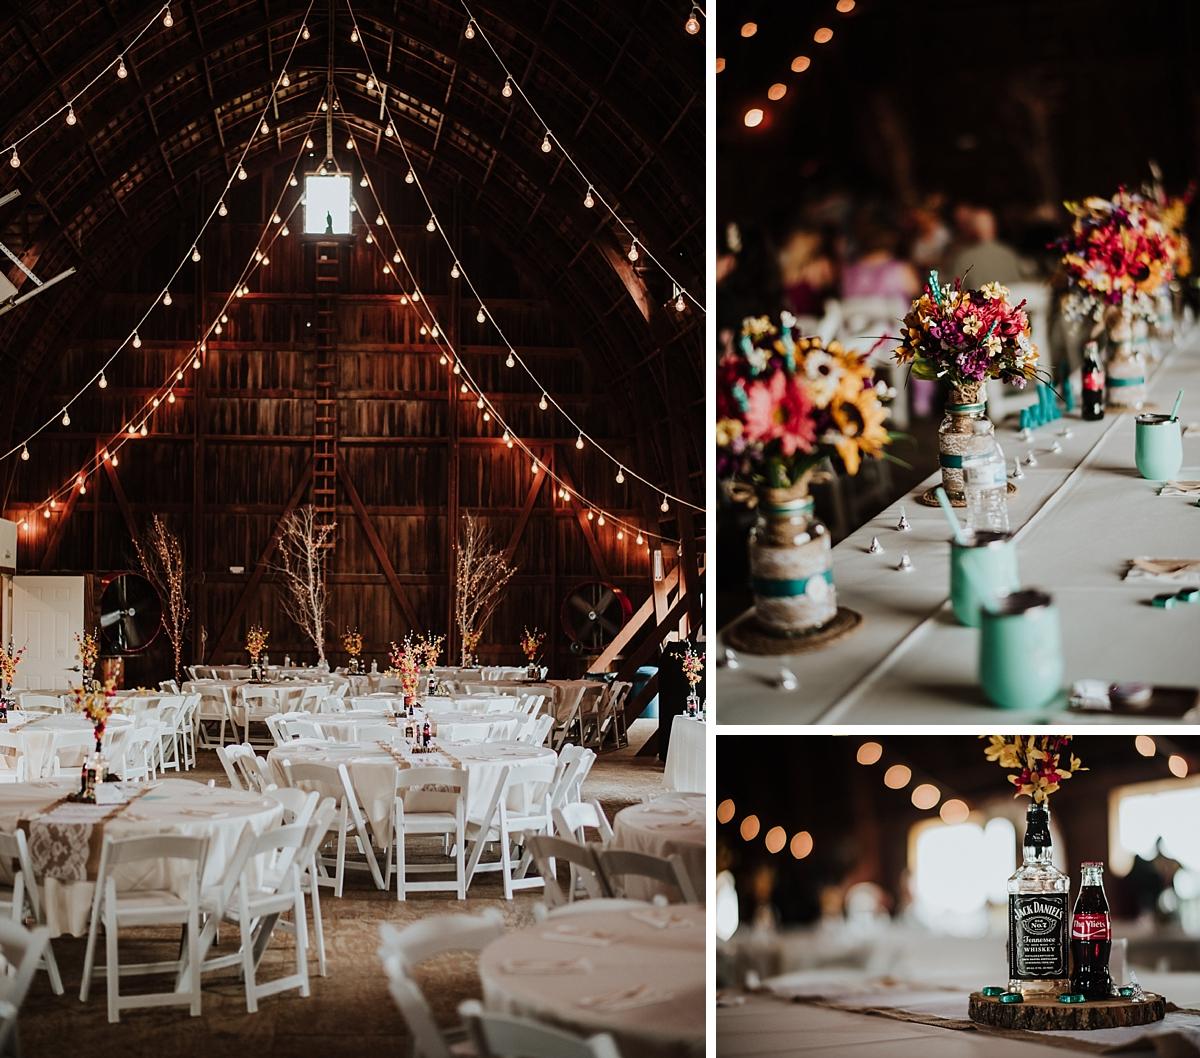 Hayloft-barn-wedding_0003.jpg